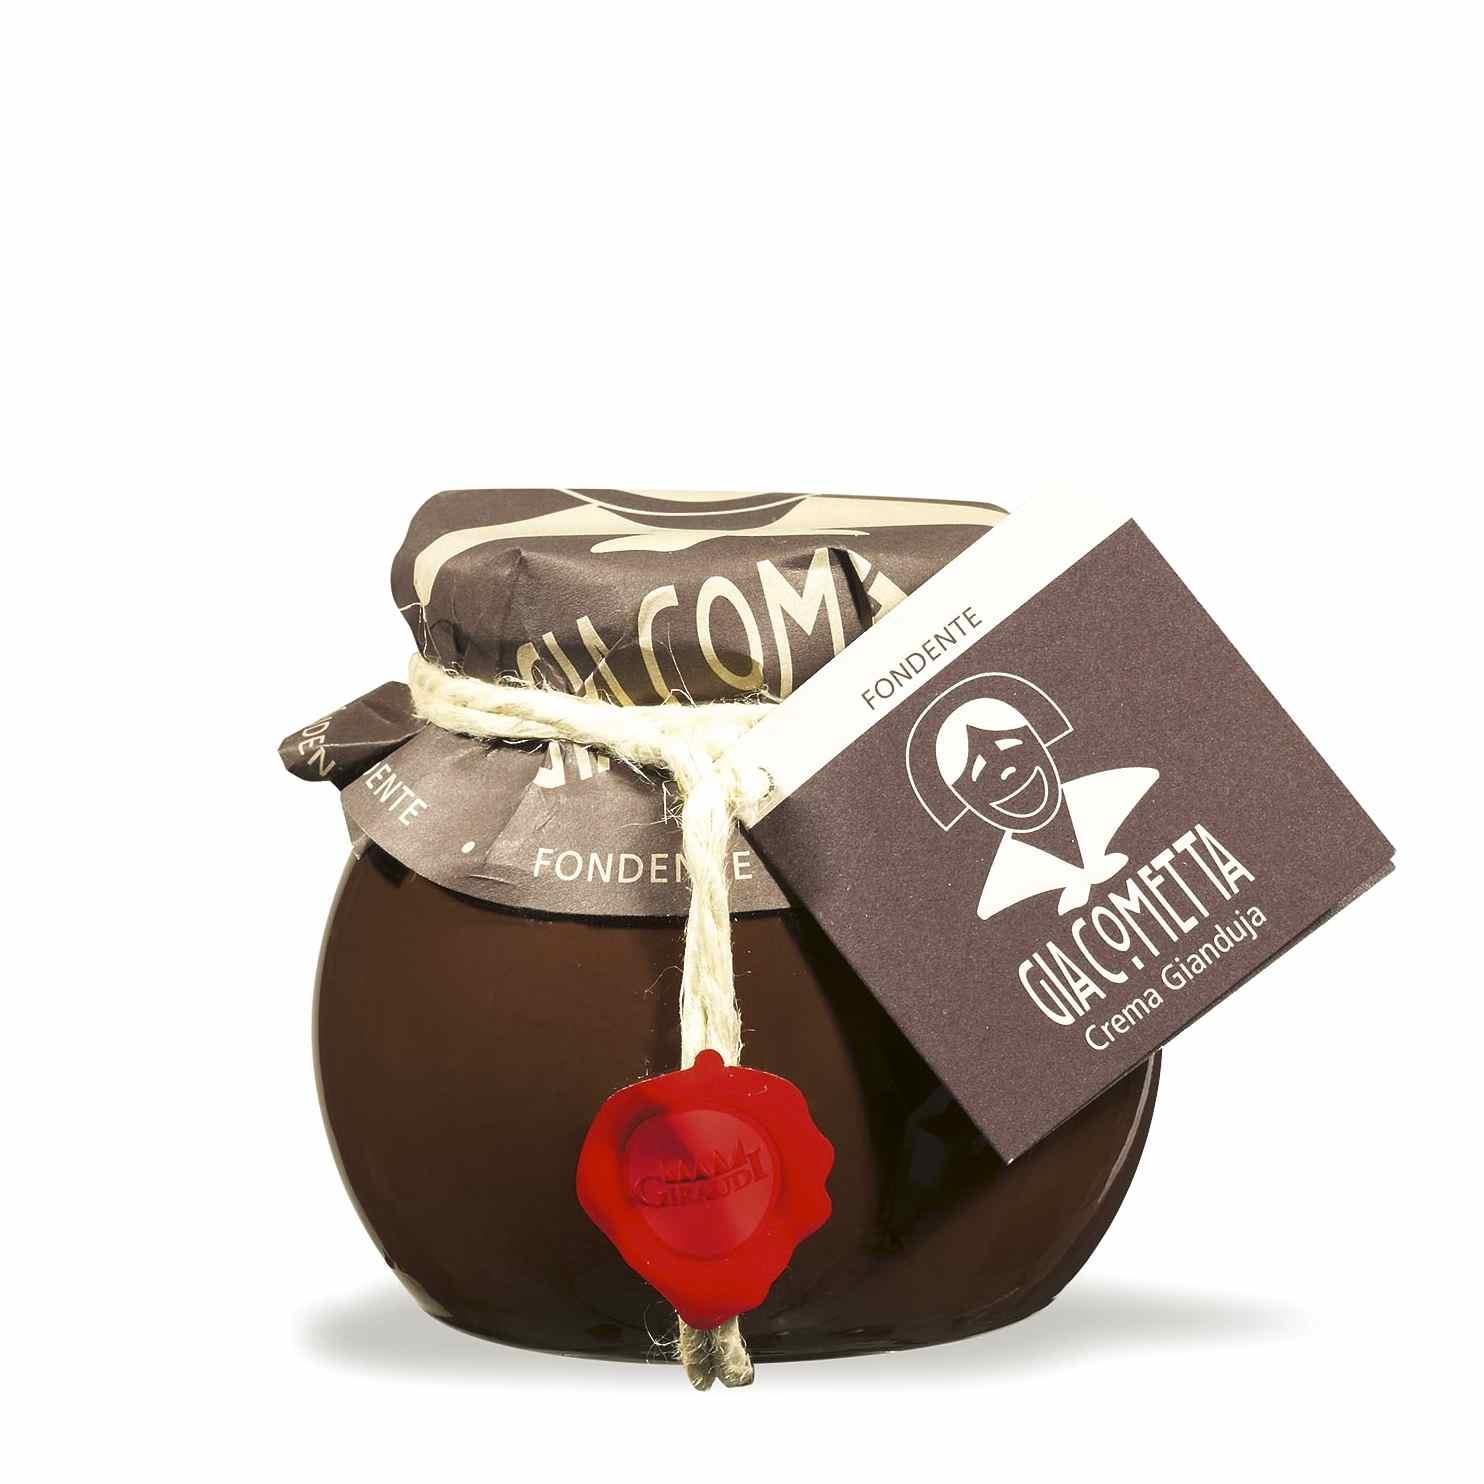 Giraudi Giacometta fondente 300 g – Giraudi dark Giacometta hazelnuts spread 300 g – Gustorotondo – Italian food boutique